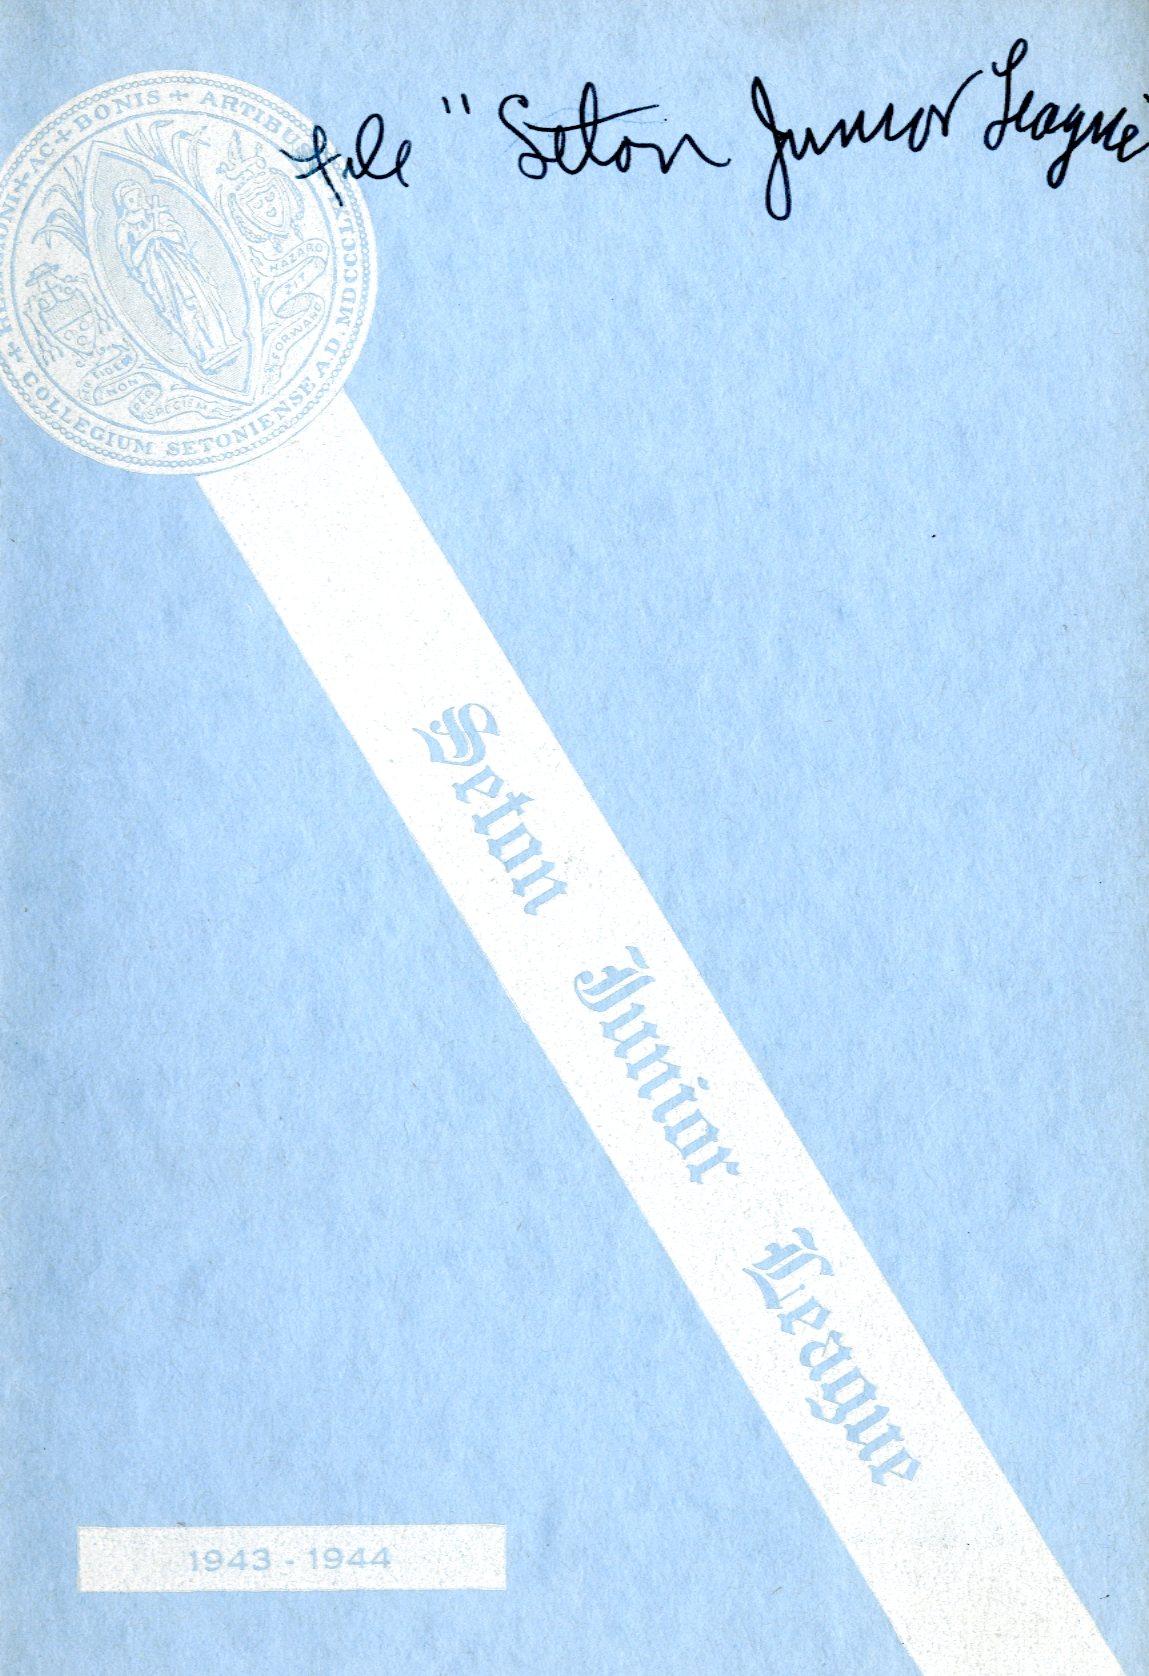 The Seton Junior League